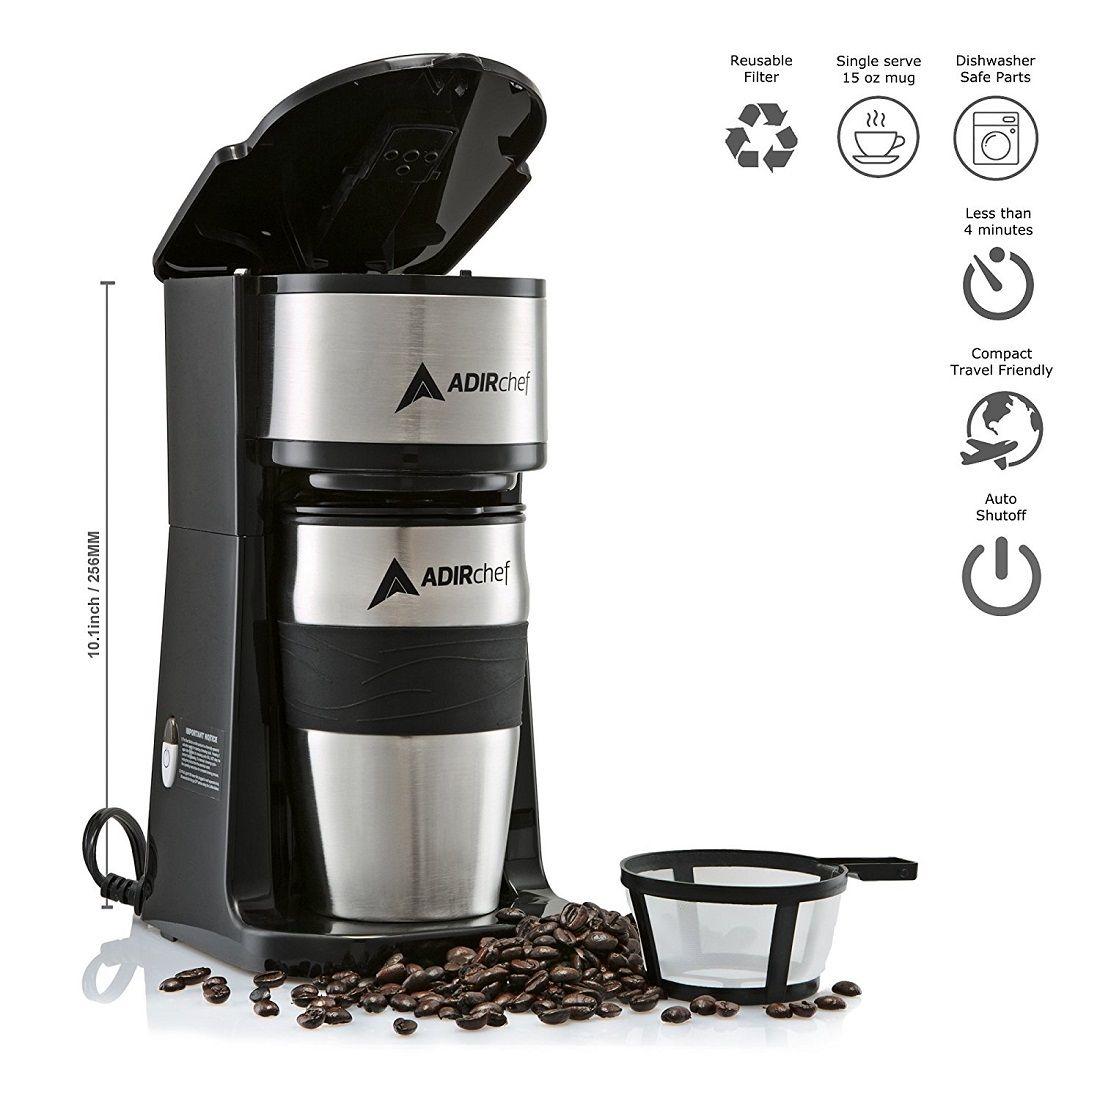 Adirchef grabn go black single serve coffee maker with